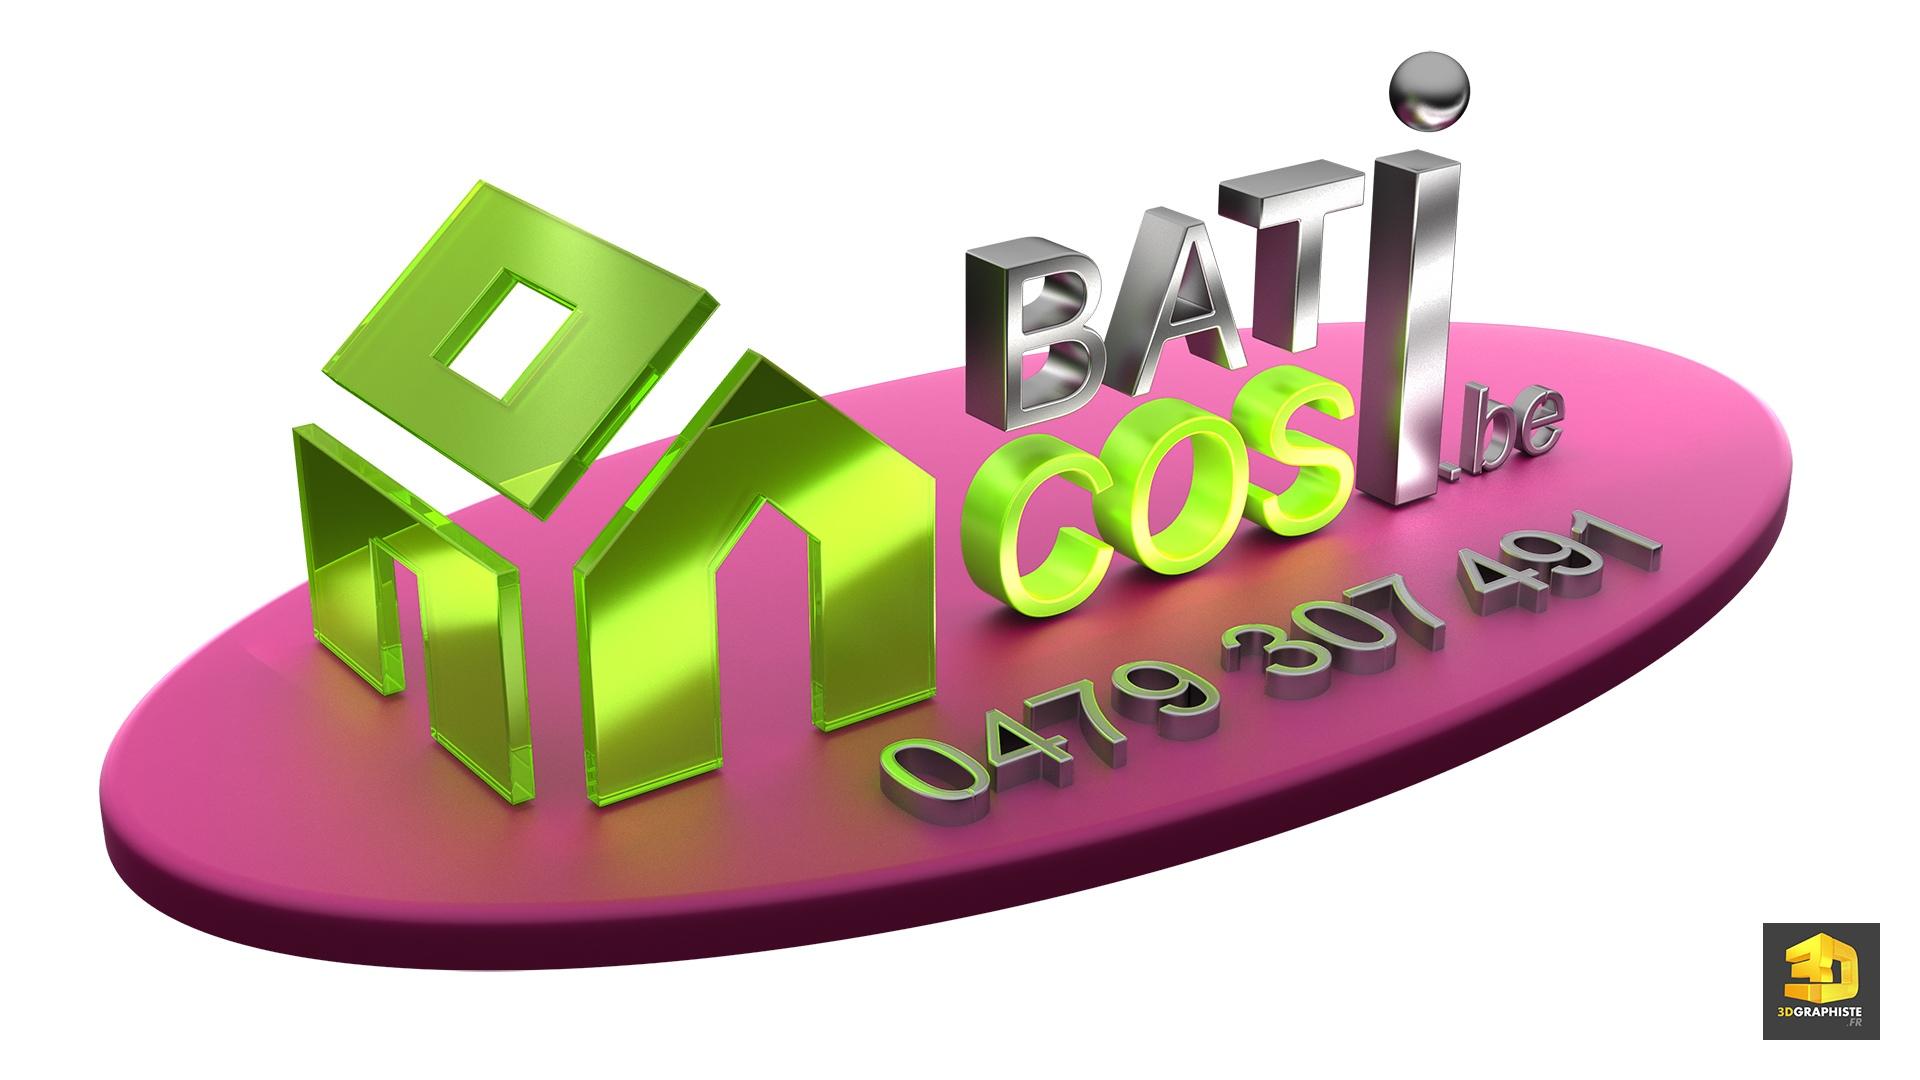 Mod lisation 3d d 39 un logo bati cosi 3dgraphiste fr for 3d modelisation